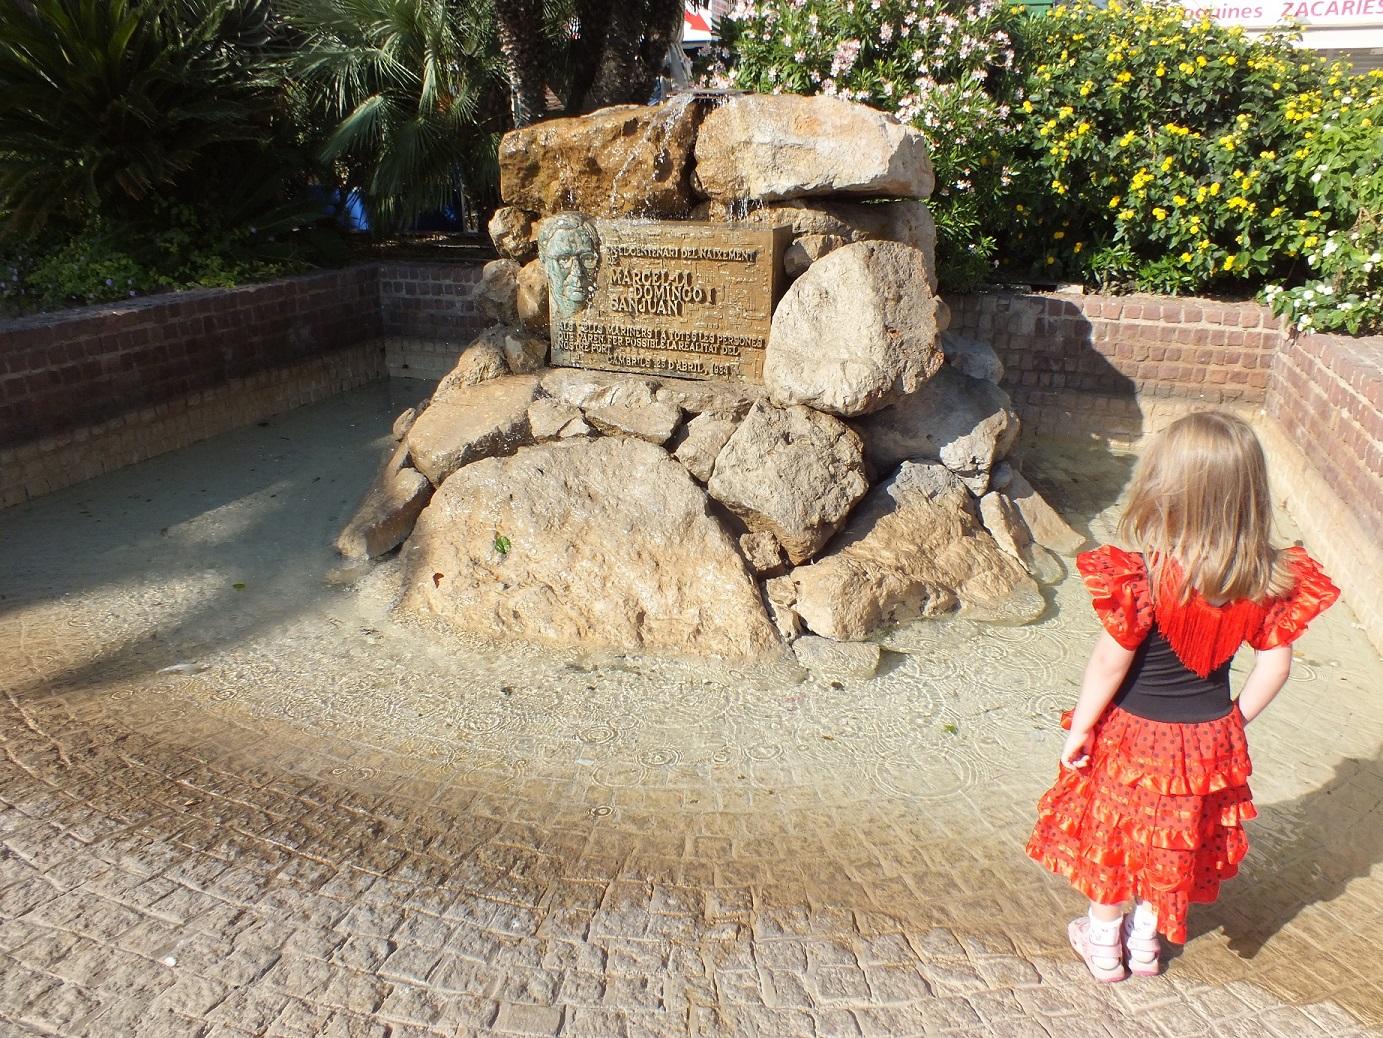 Cambrils monument to Marcelli Domingo SJ